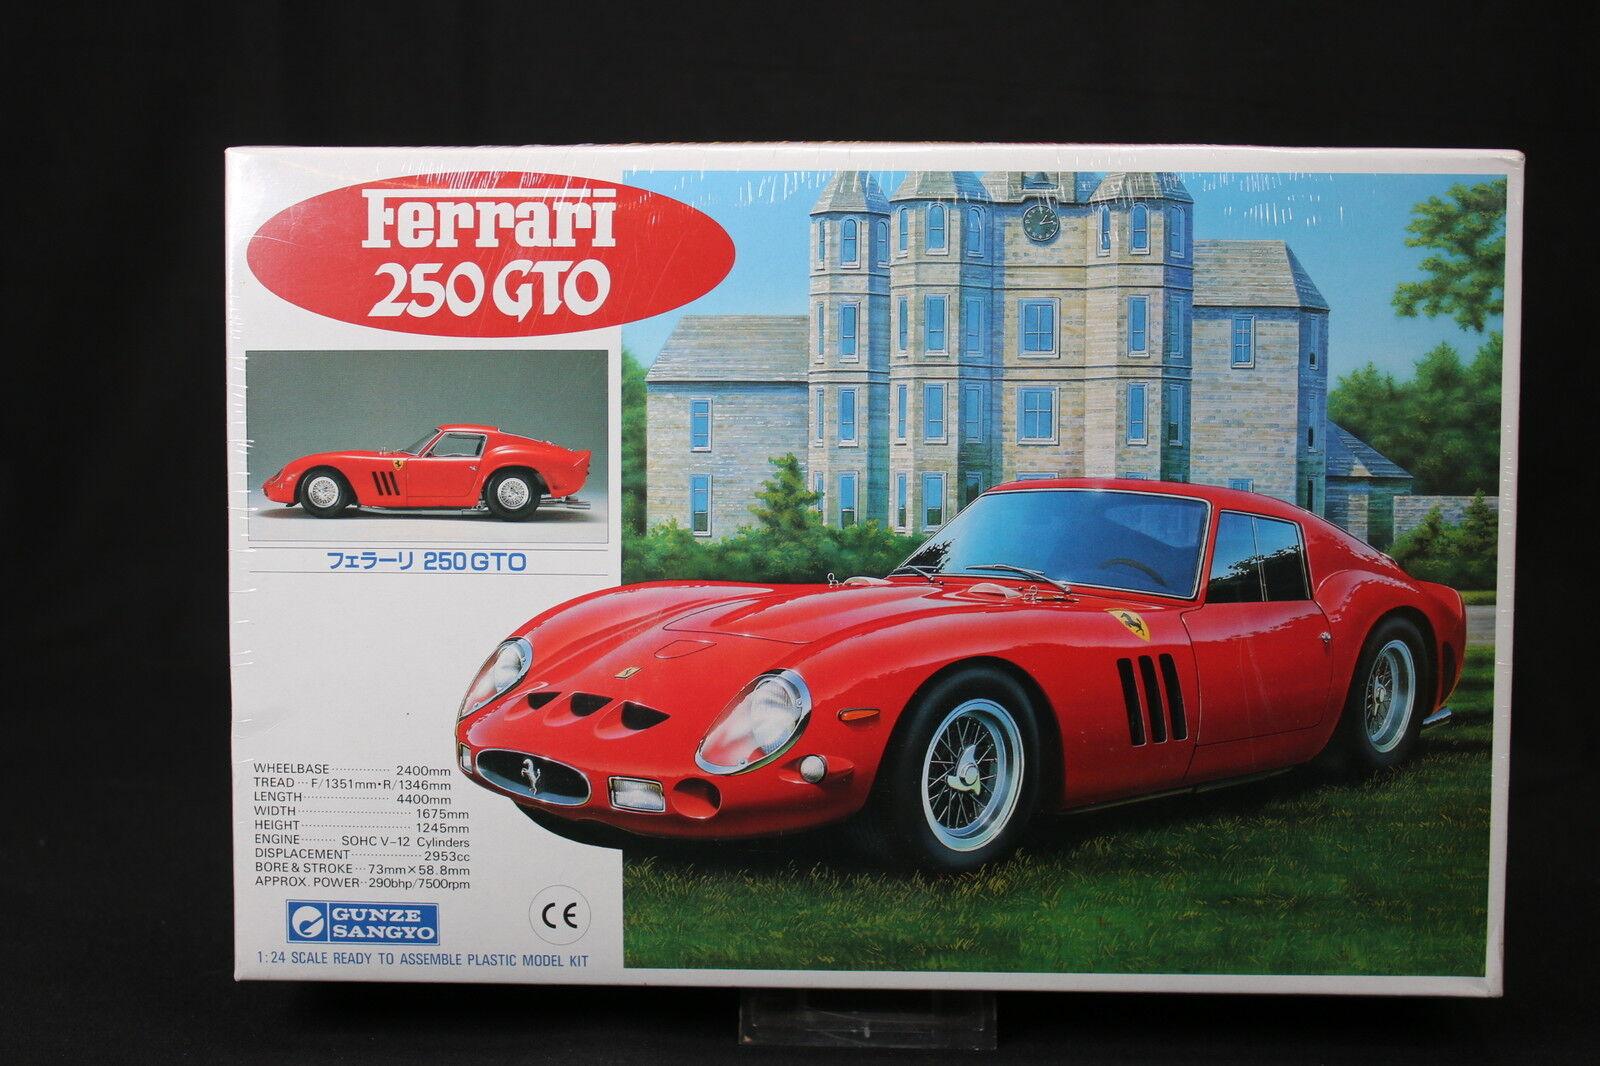 YV007 GUNZE SANGYO 1 24 maquette voiture G-150 1000 Ferrari 250 GTO 150 1989